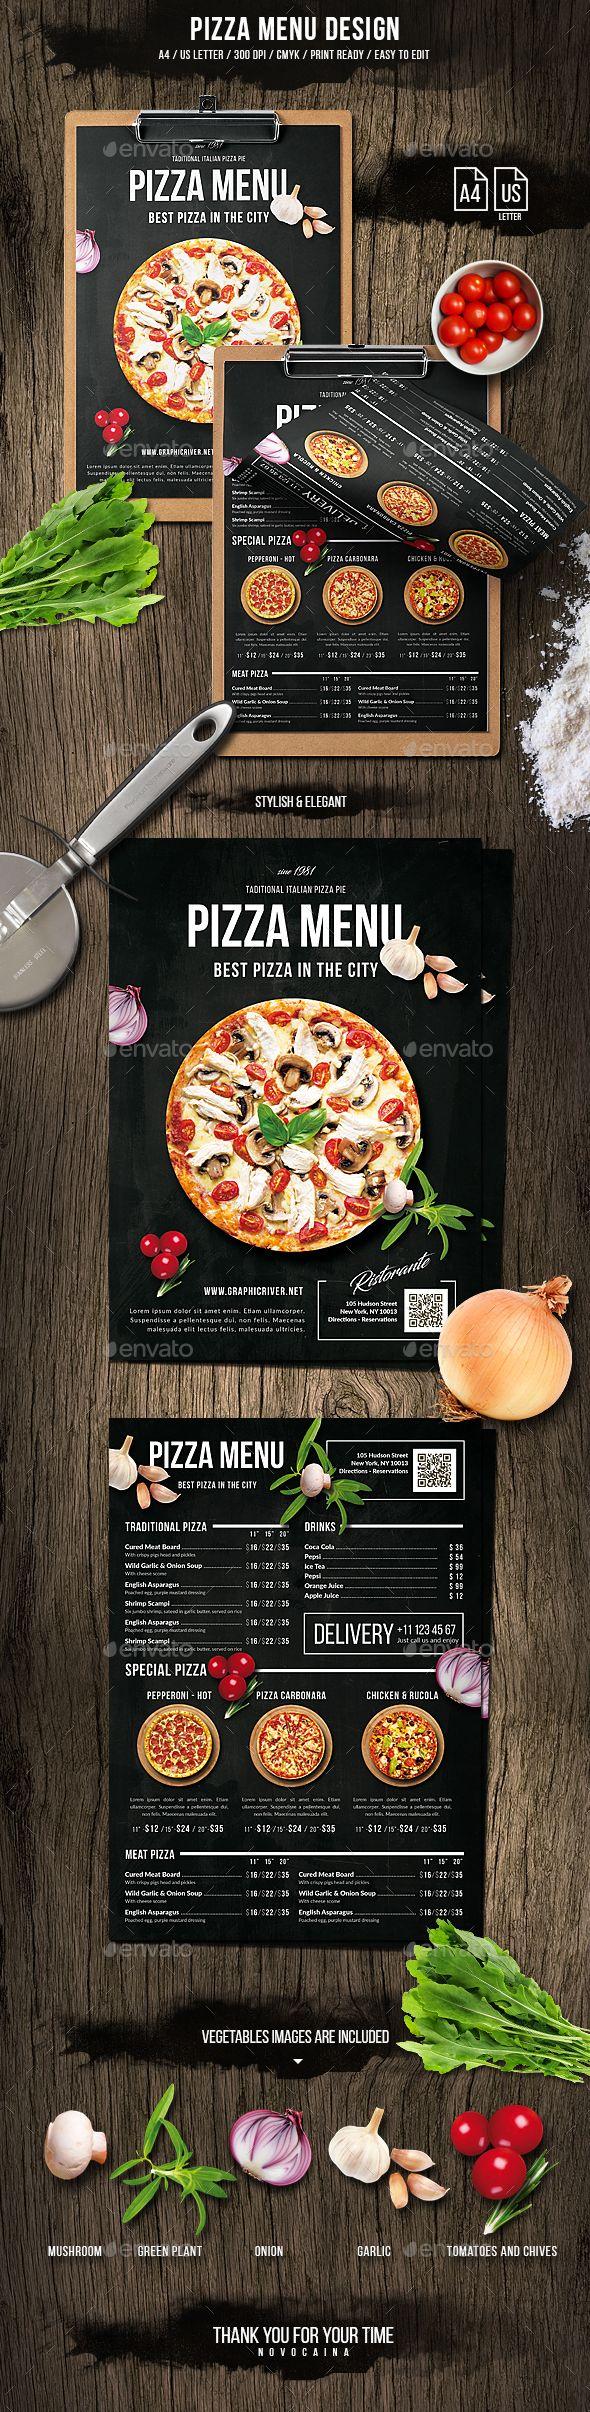 Pizza Menu Design  A4 and US Letter — Photoshop PSD #pizza • Download ➝ https://graphicriver.net/item/pizza-menu-design-a4-and-us-letter/20035663?ref=pxcr